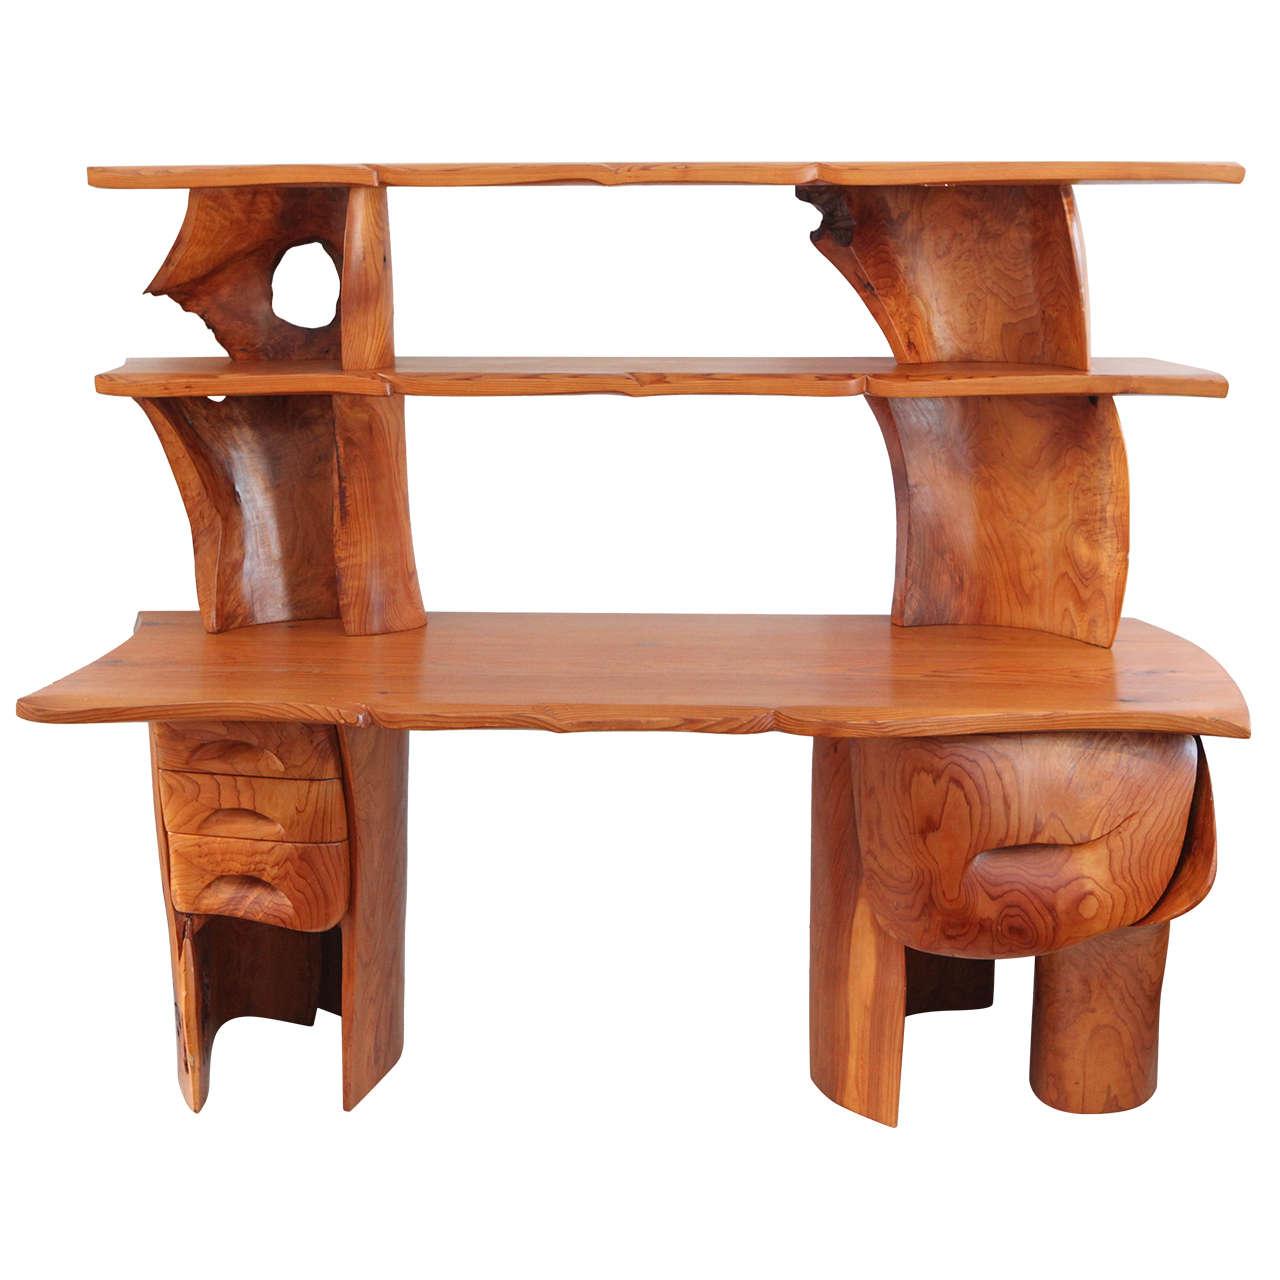 Scott Jaster Studio Organic Carved Desk 1